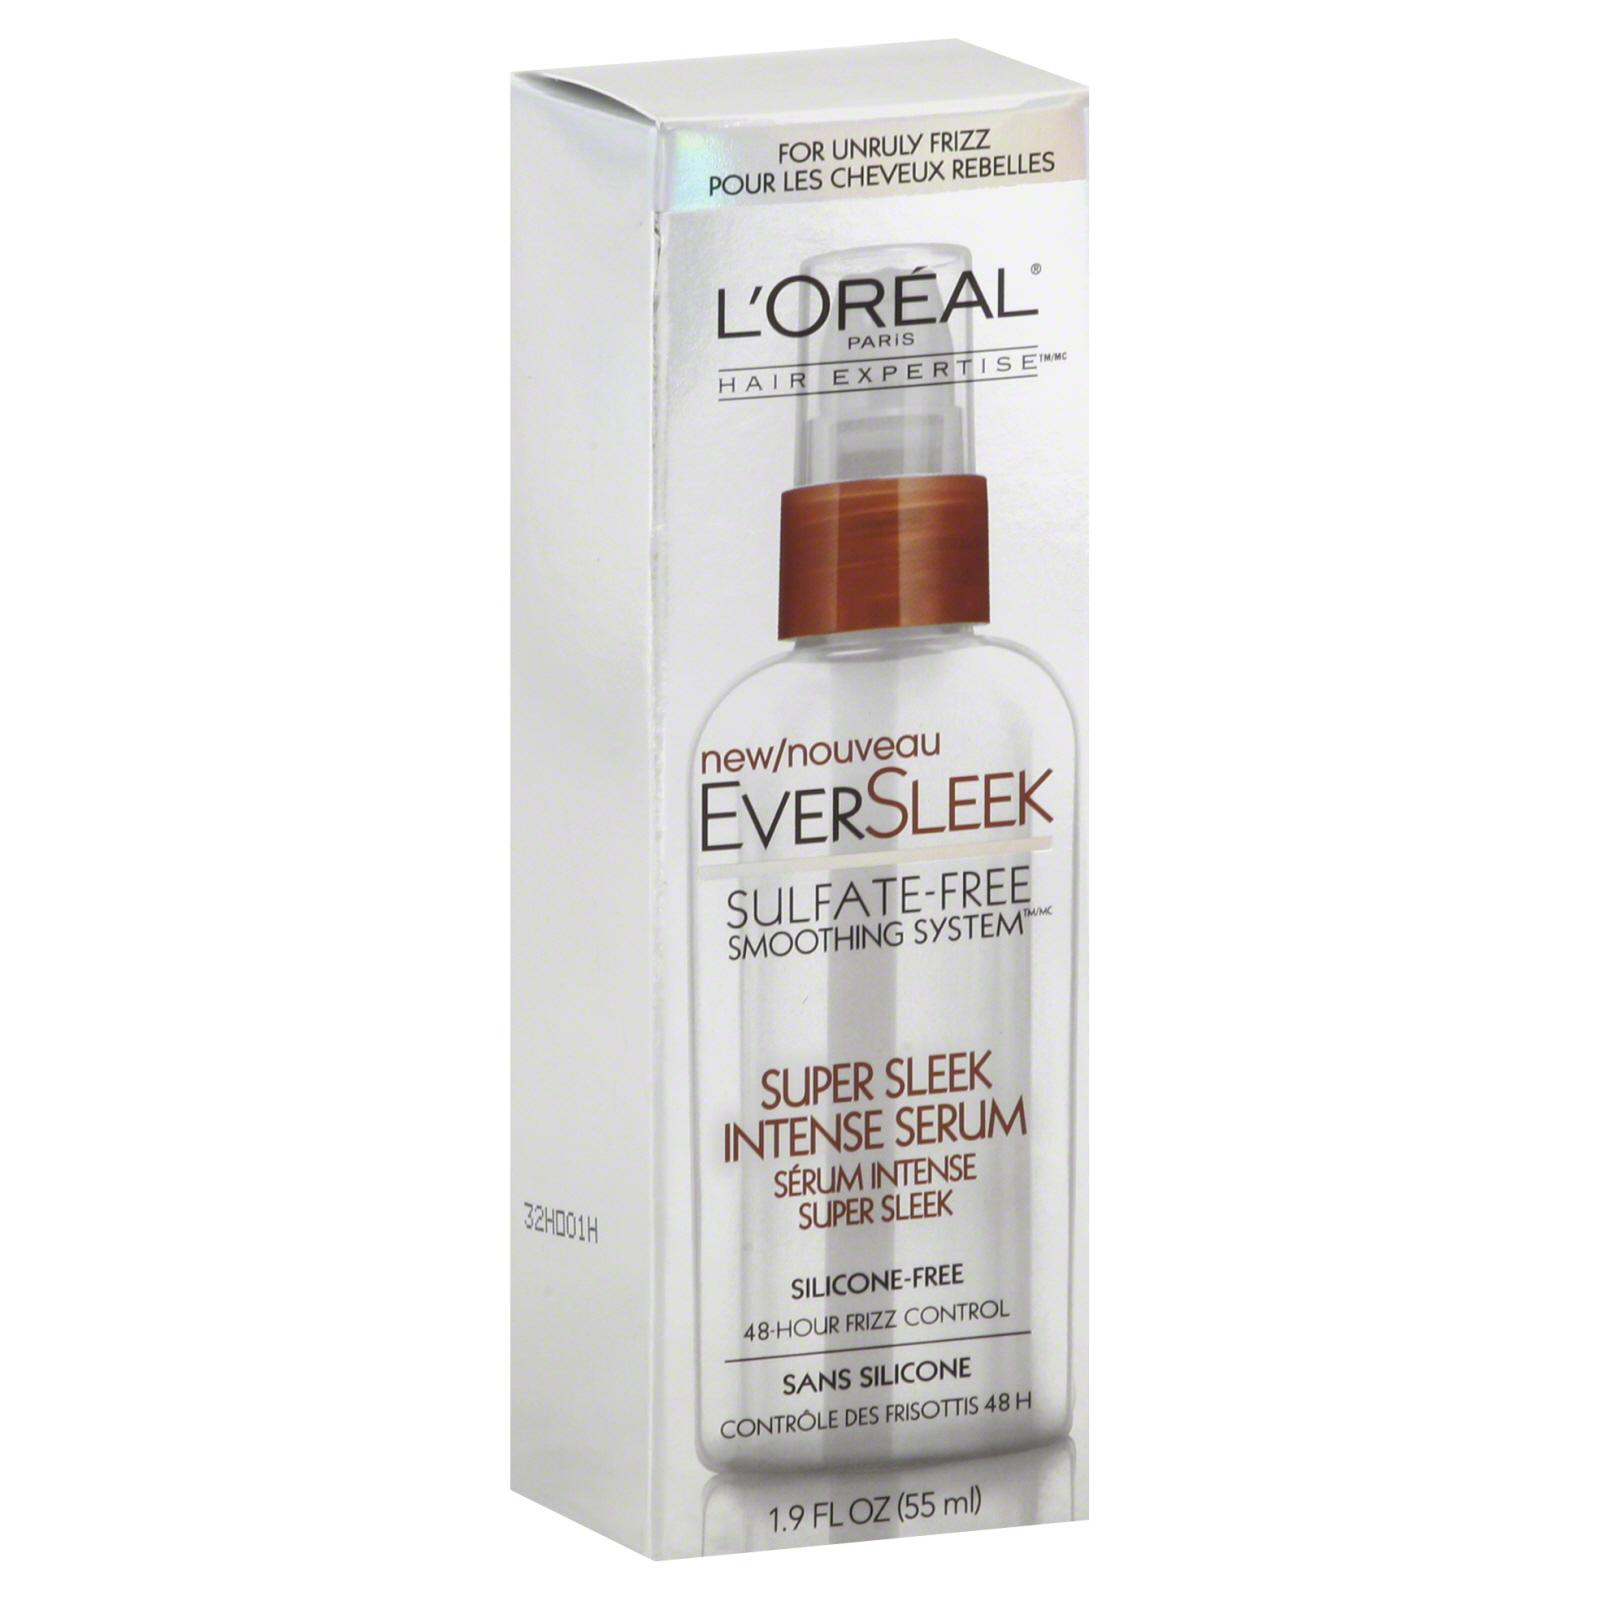 L'Oreal Hair Expertise EverSleek Intense Serum, Super Sleek, 1.9 oz (55 ml)